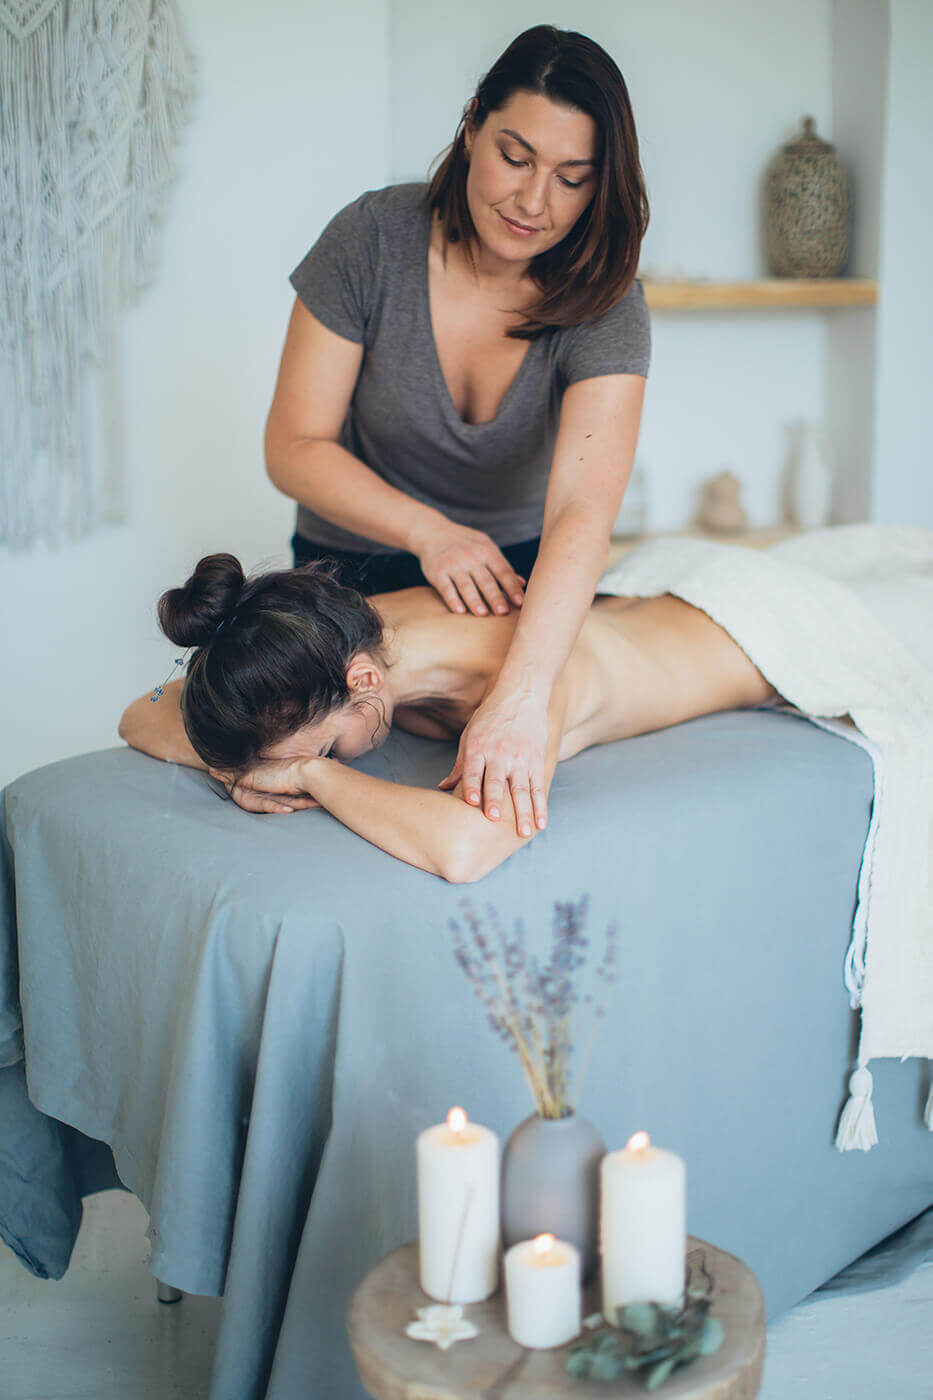 Wellnessmassage Bekleidung